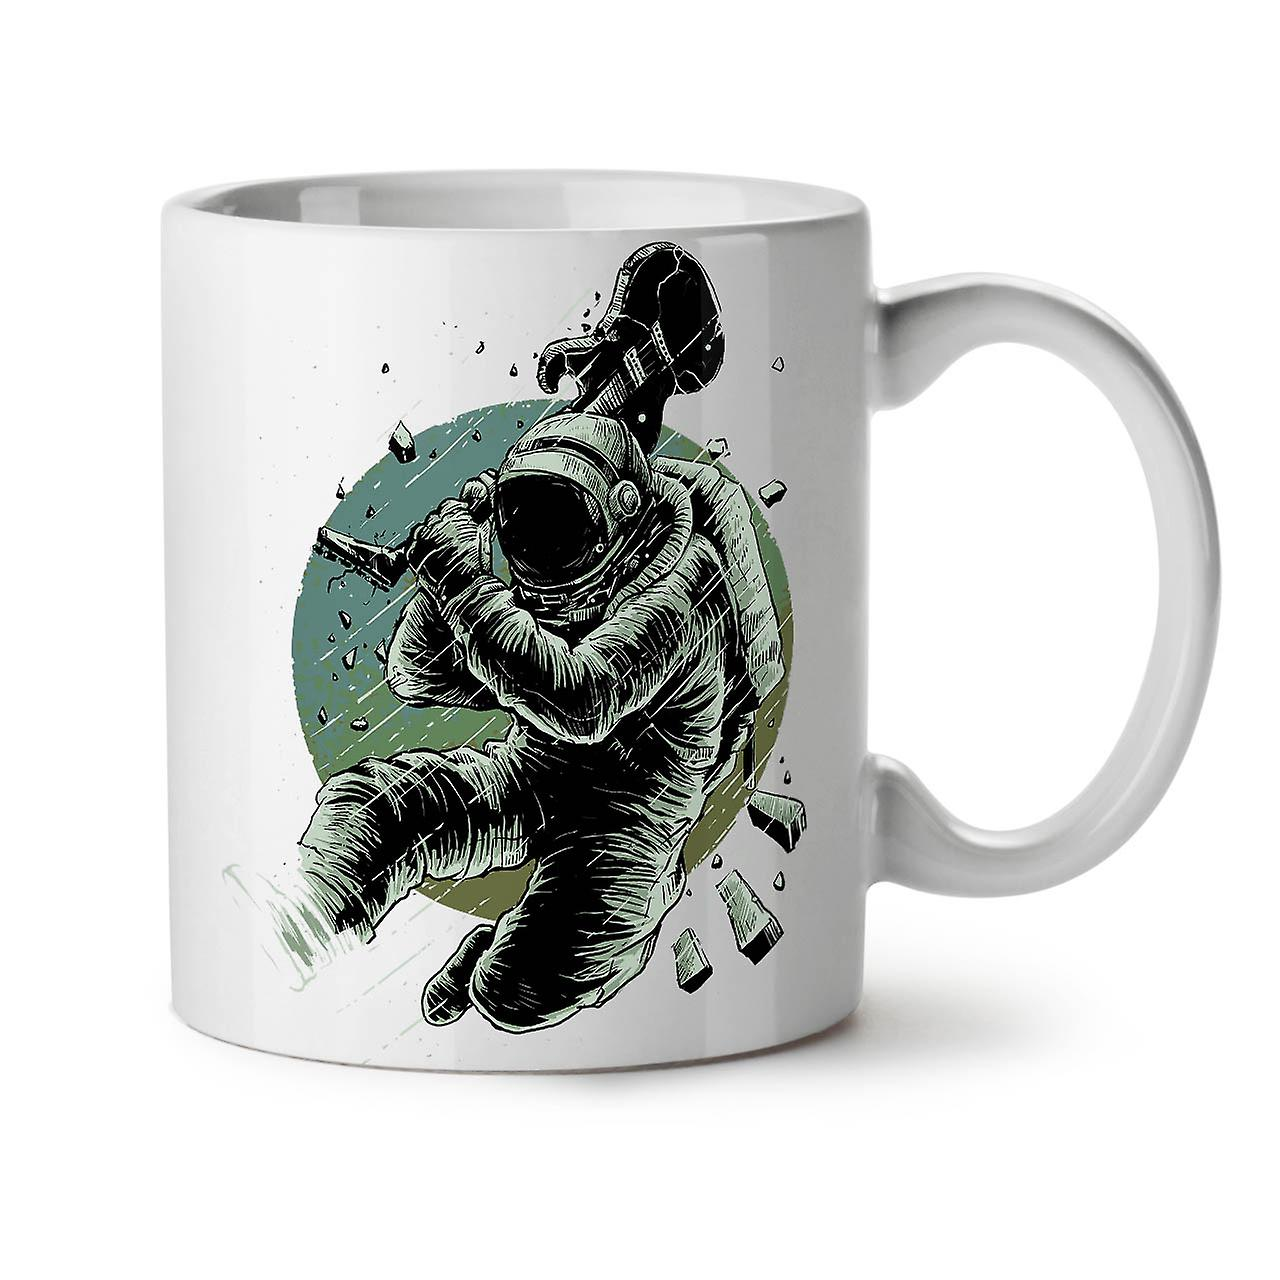 L'astronaute Nouveau OzWellcoda Tasse Céramique 11 Café Espace Thé Guitare Blanc b7gyfY6Iv